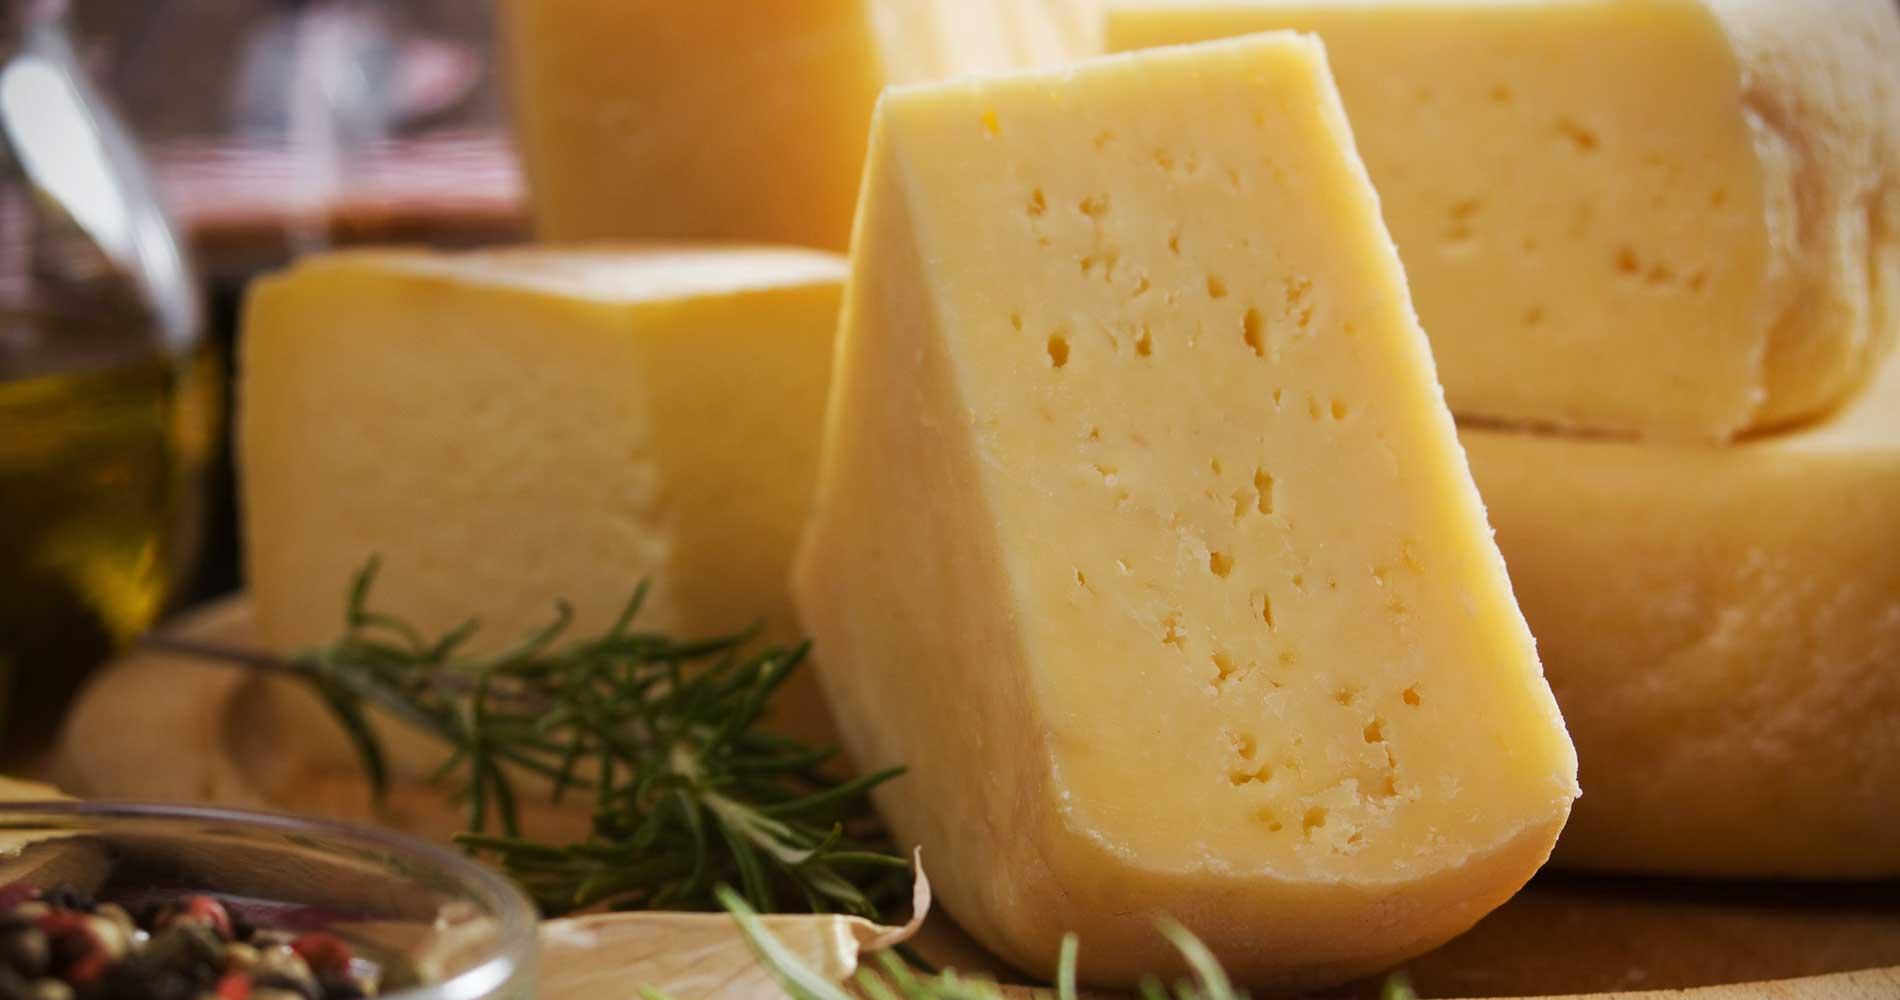 Sheep Tulum cheese. (Image Credit-Eskapas)